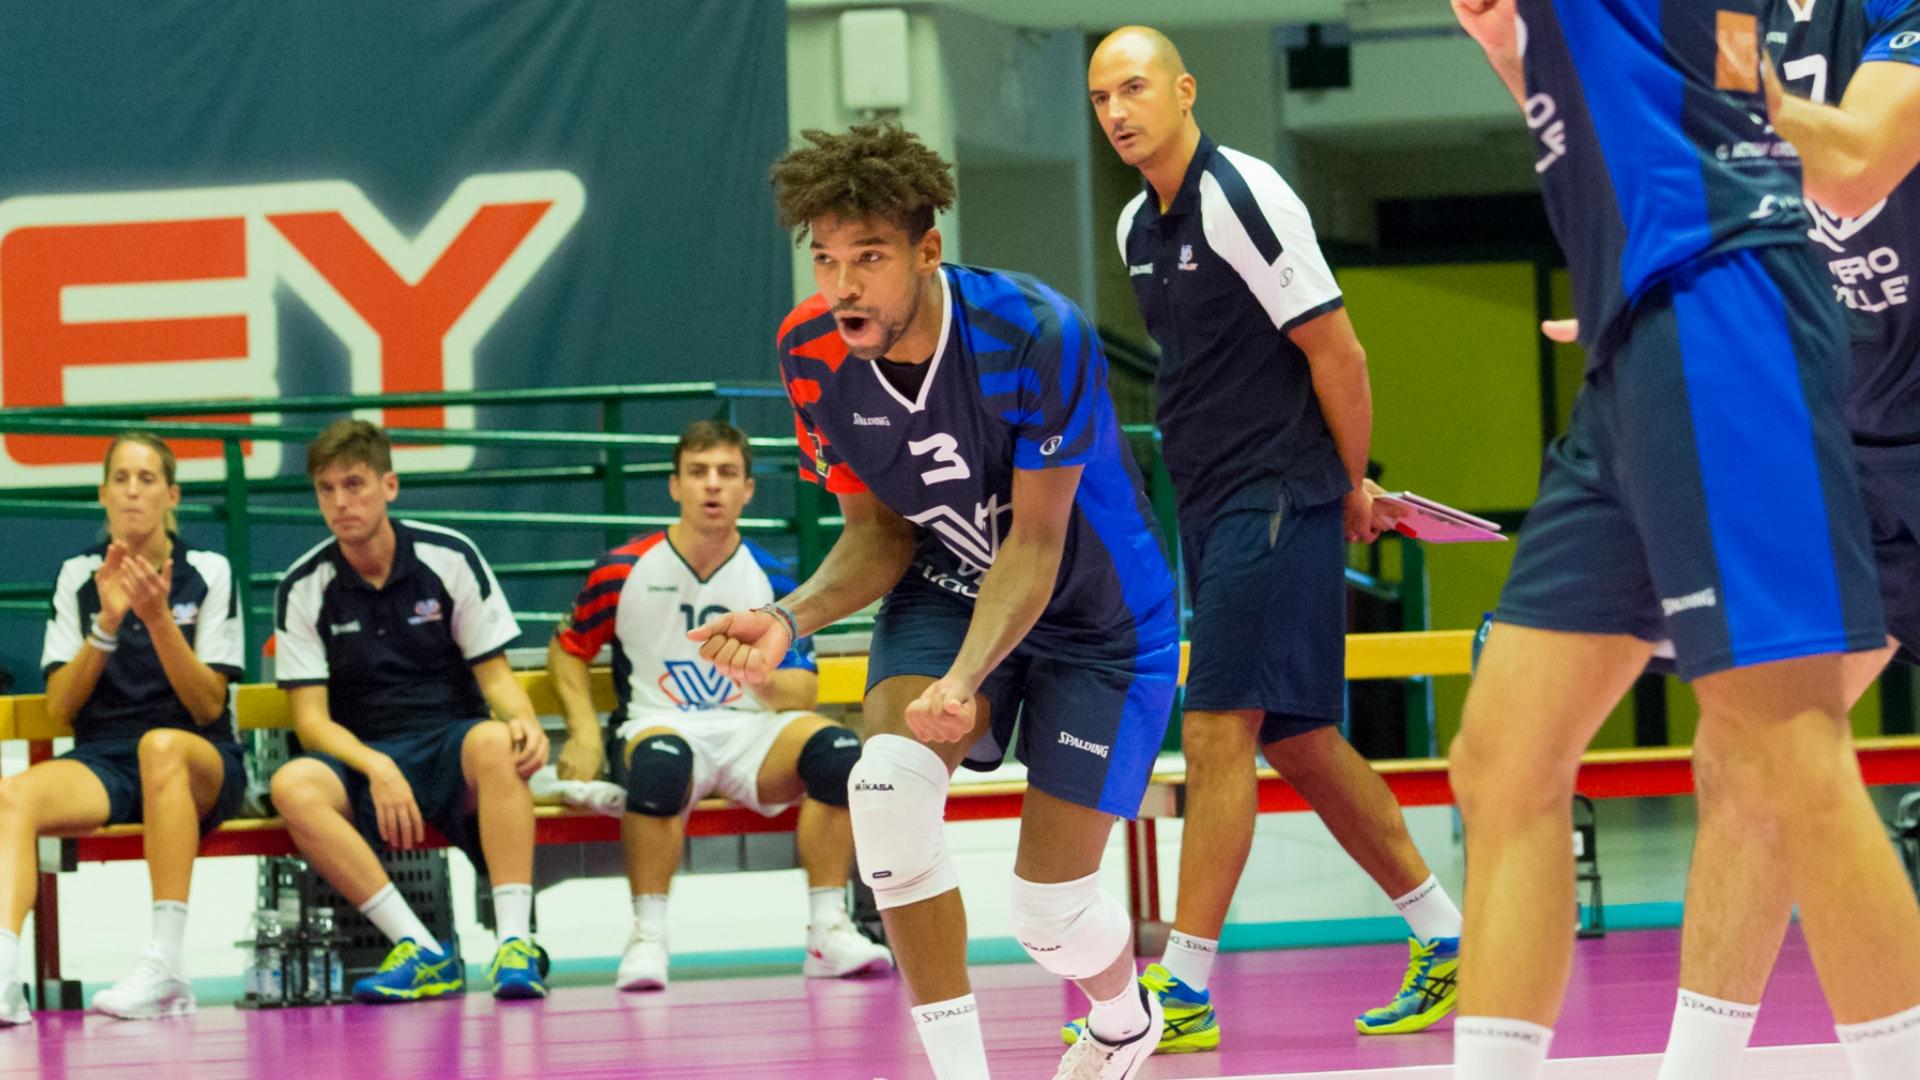 Photogallery: Vero Volley Monza vs Leo Shoes Modena